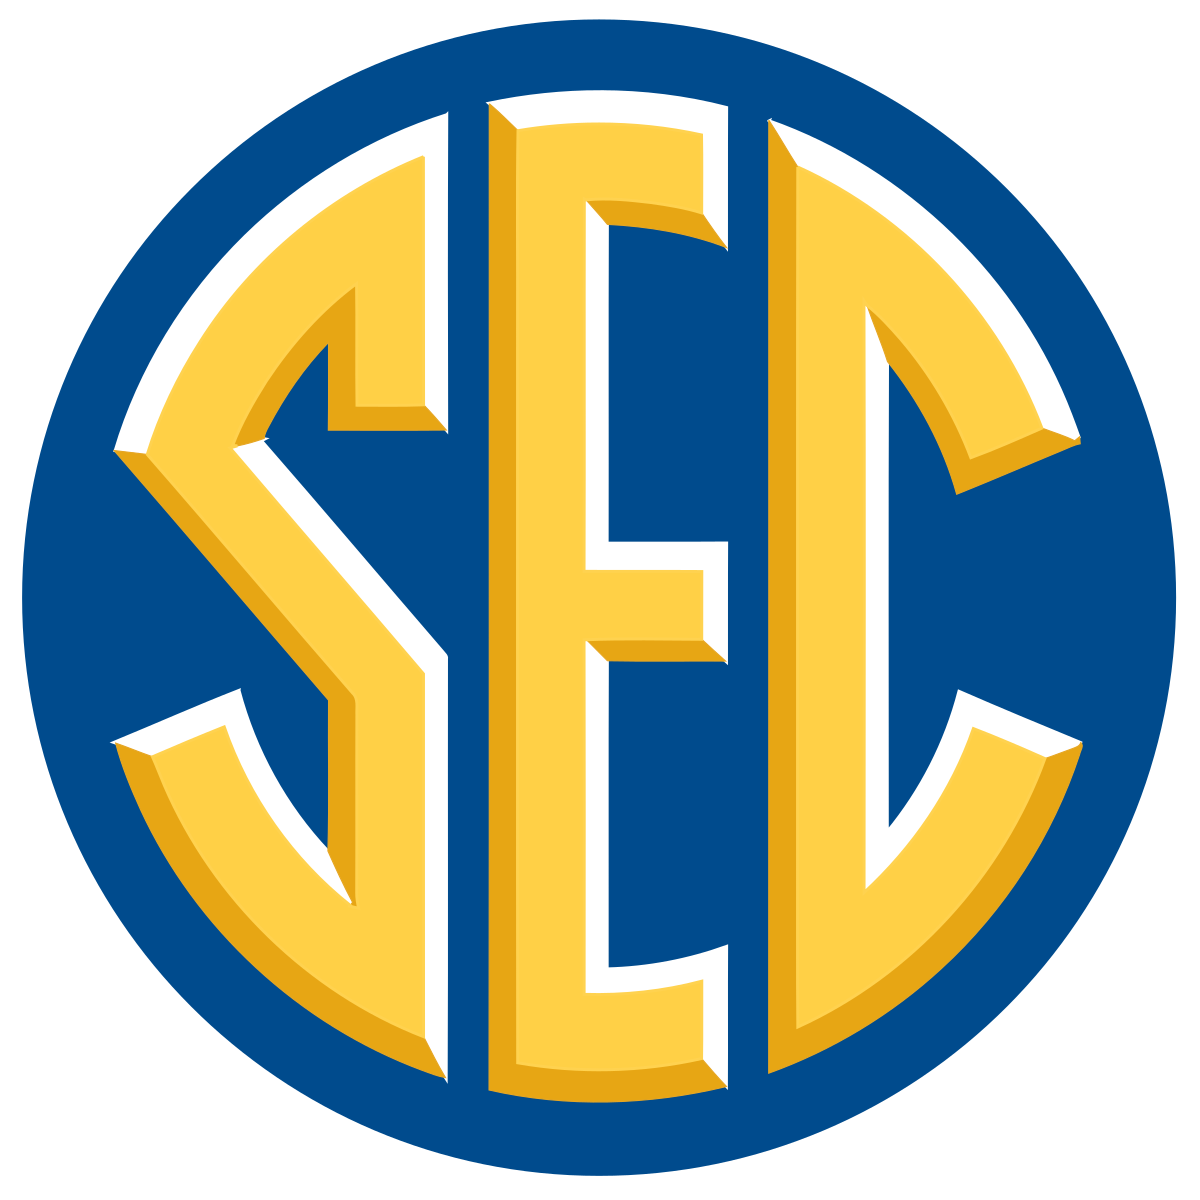 Southeastern Conference Logo